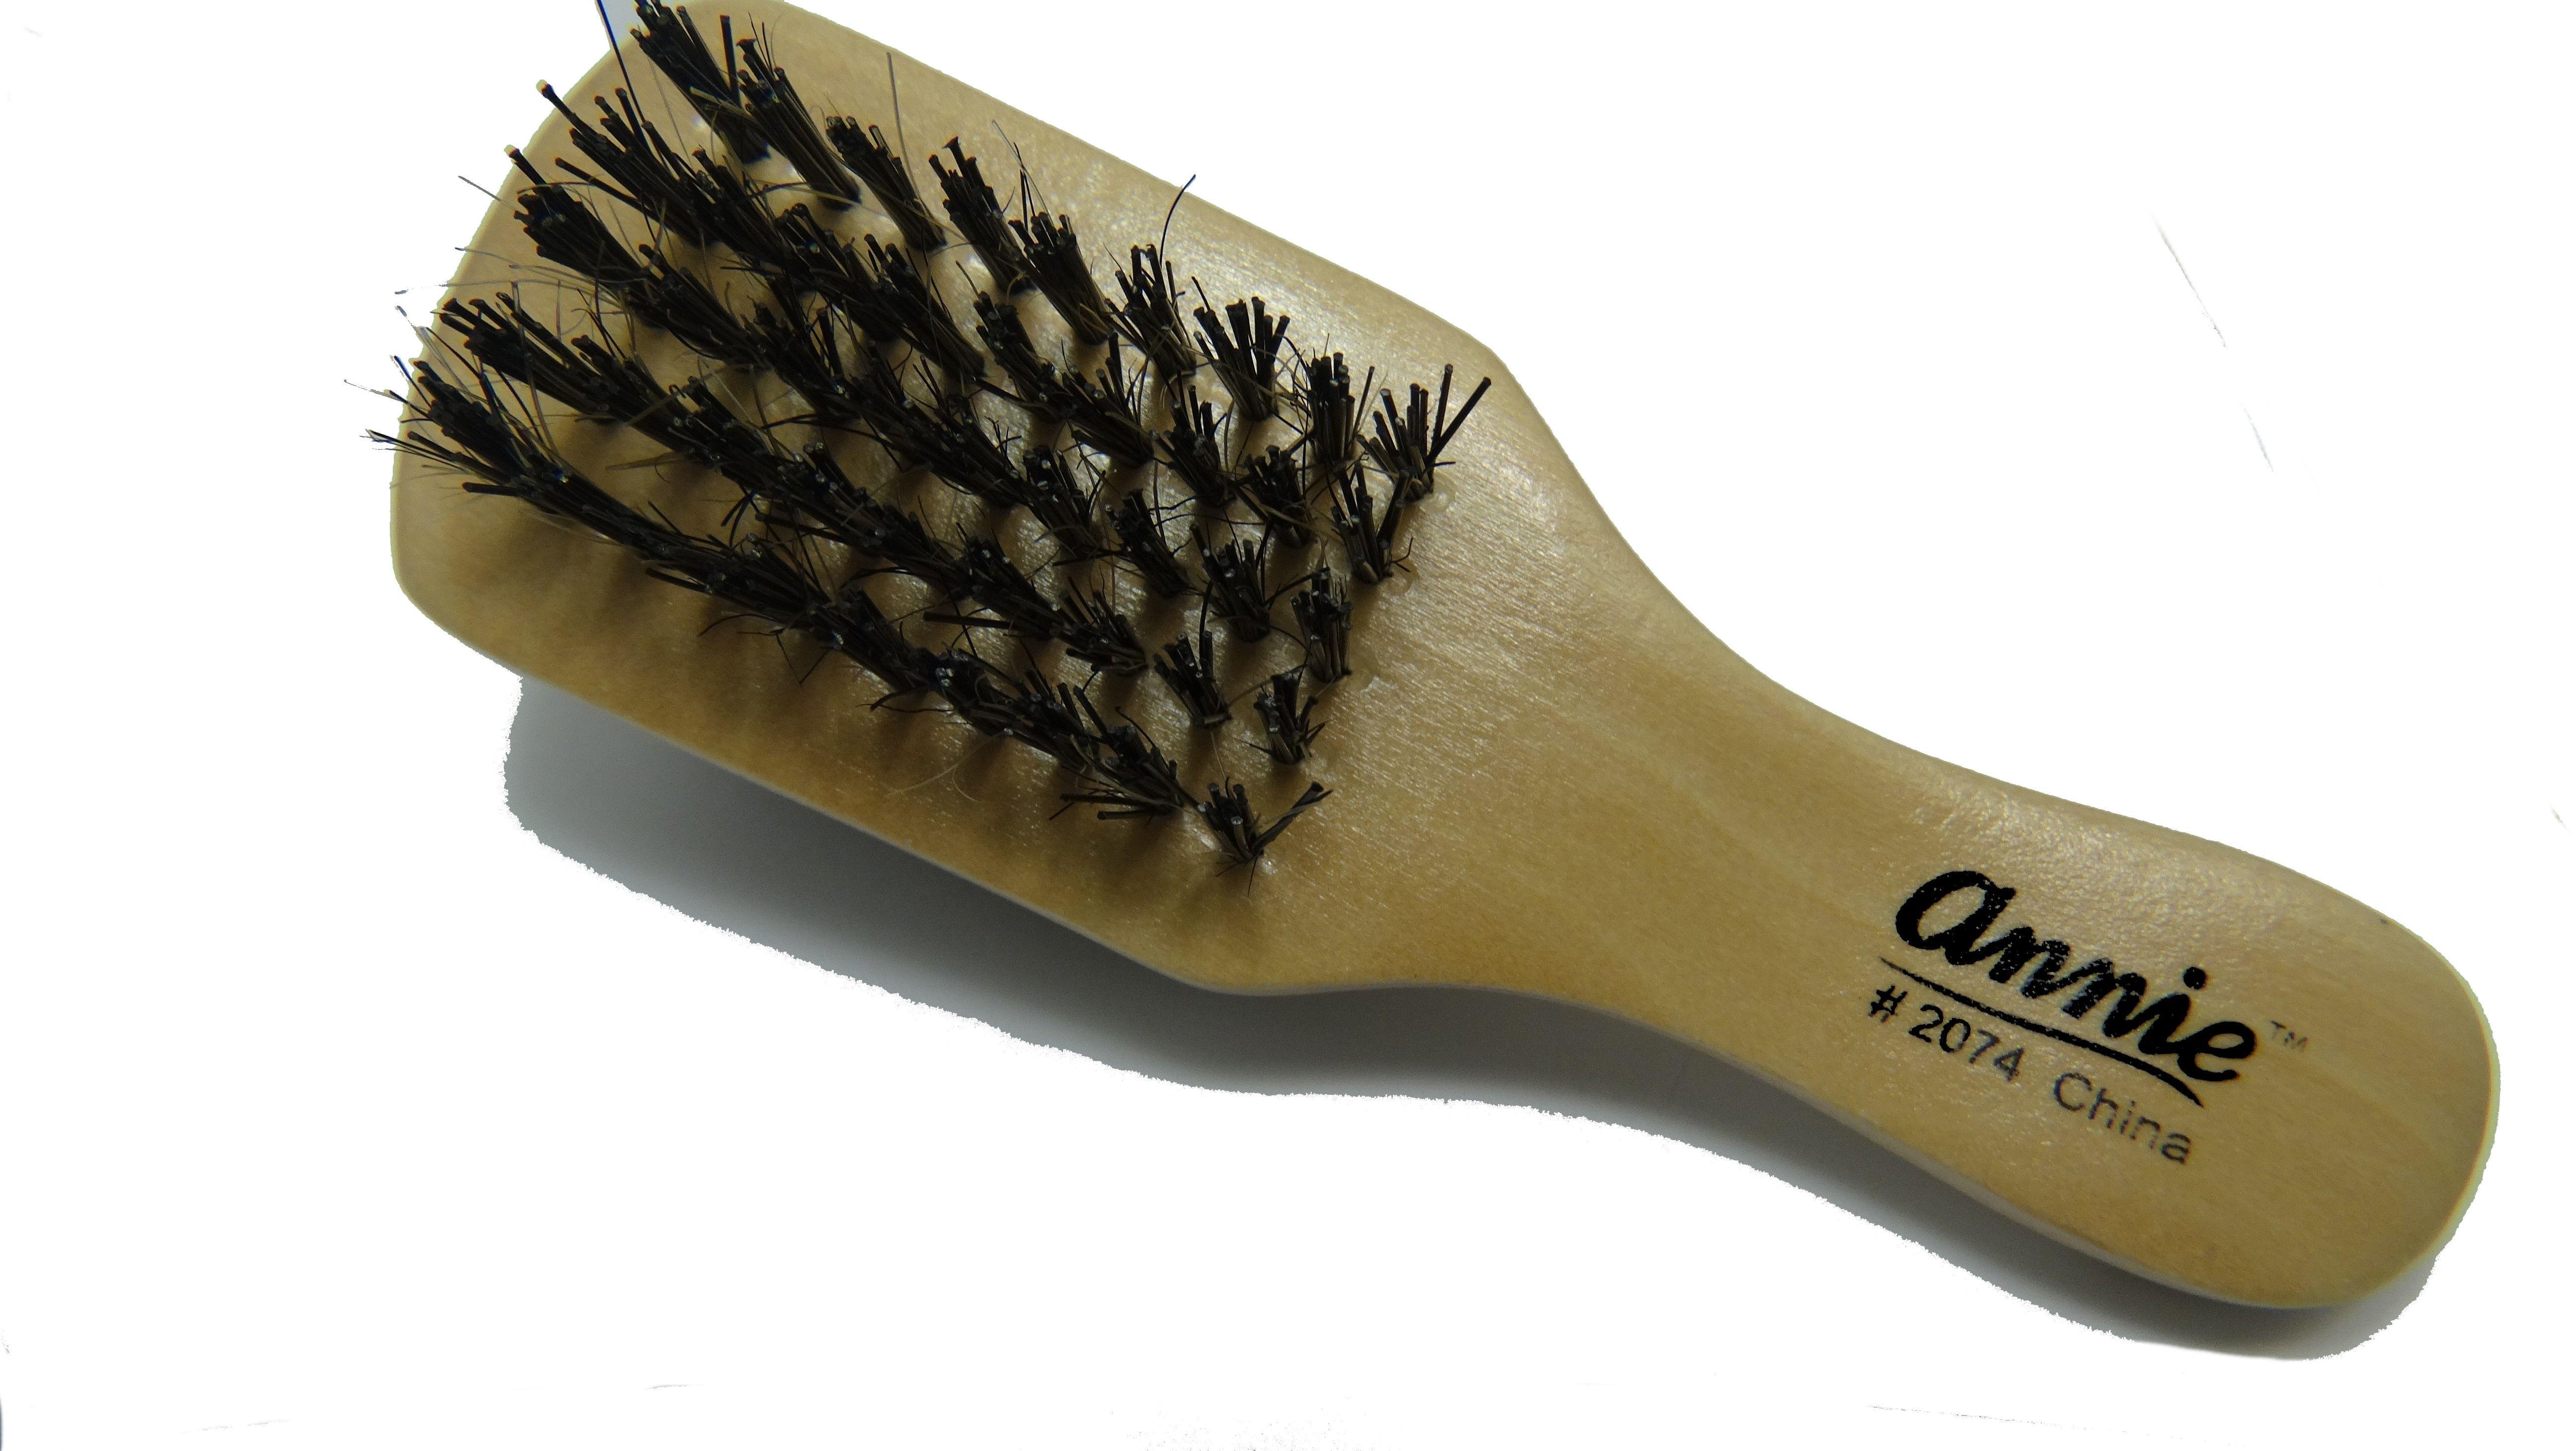 Annie 2074 Hard & Soft Reinforced Boar Bristle Hair